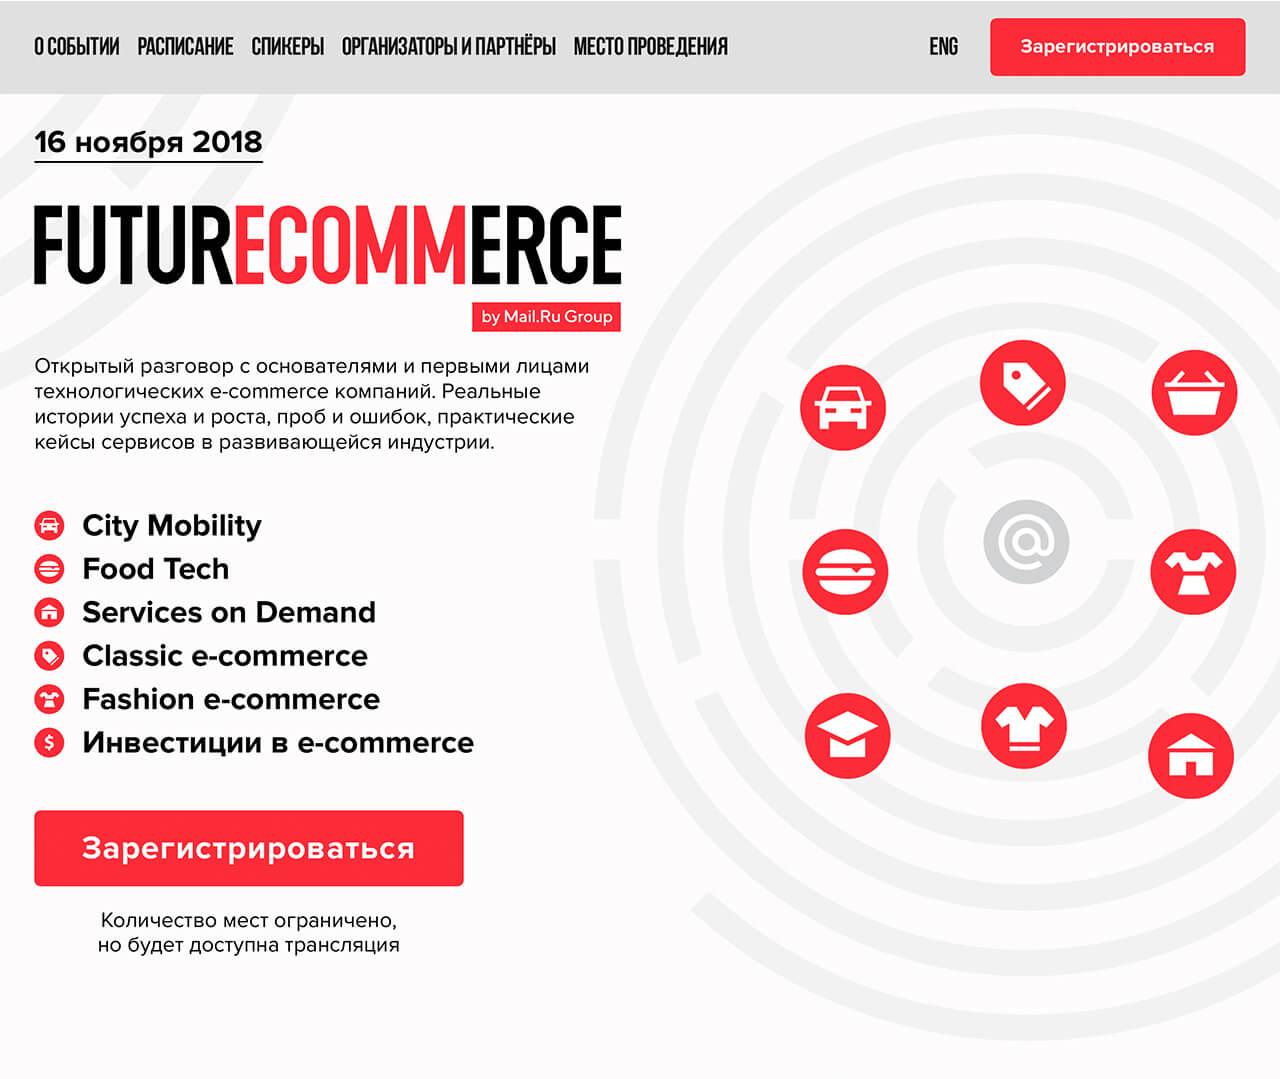 Адаптивная верстка - FuturEcommerce by Mail.ru Group (лендинг)